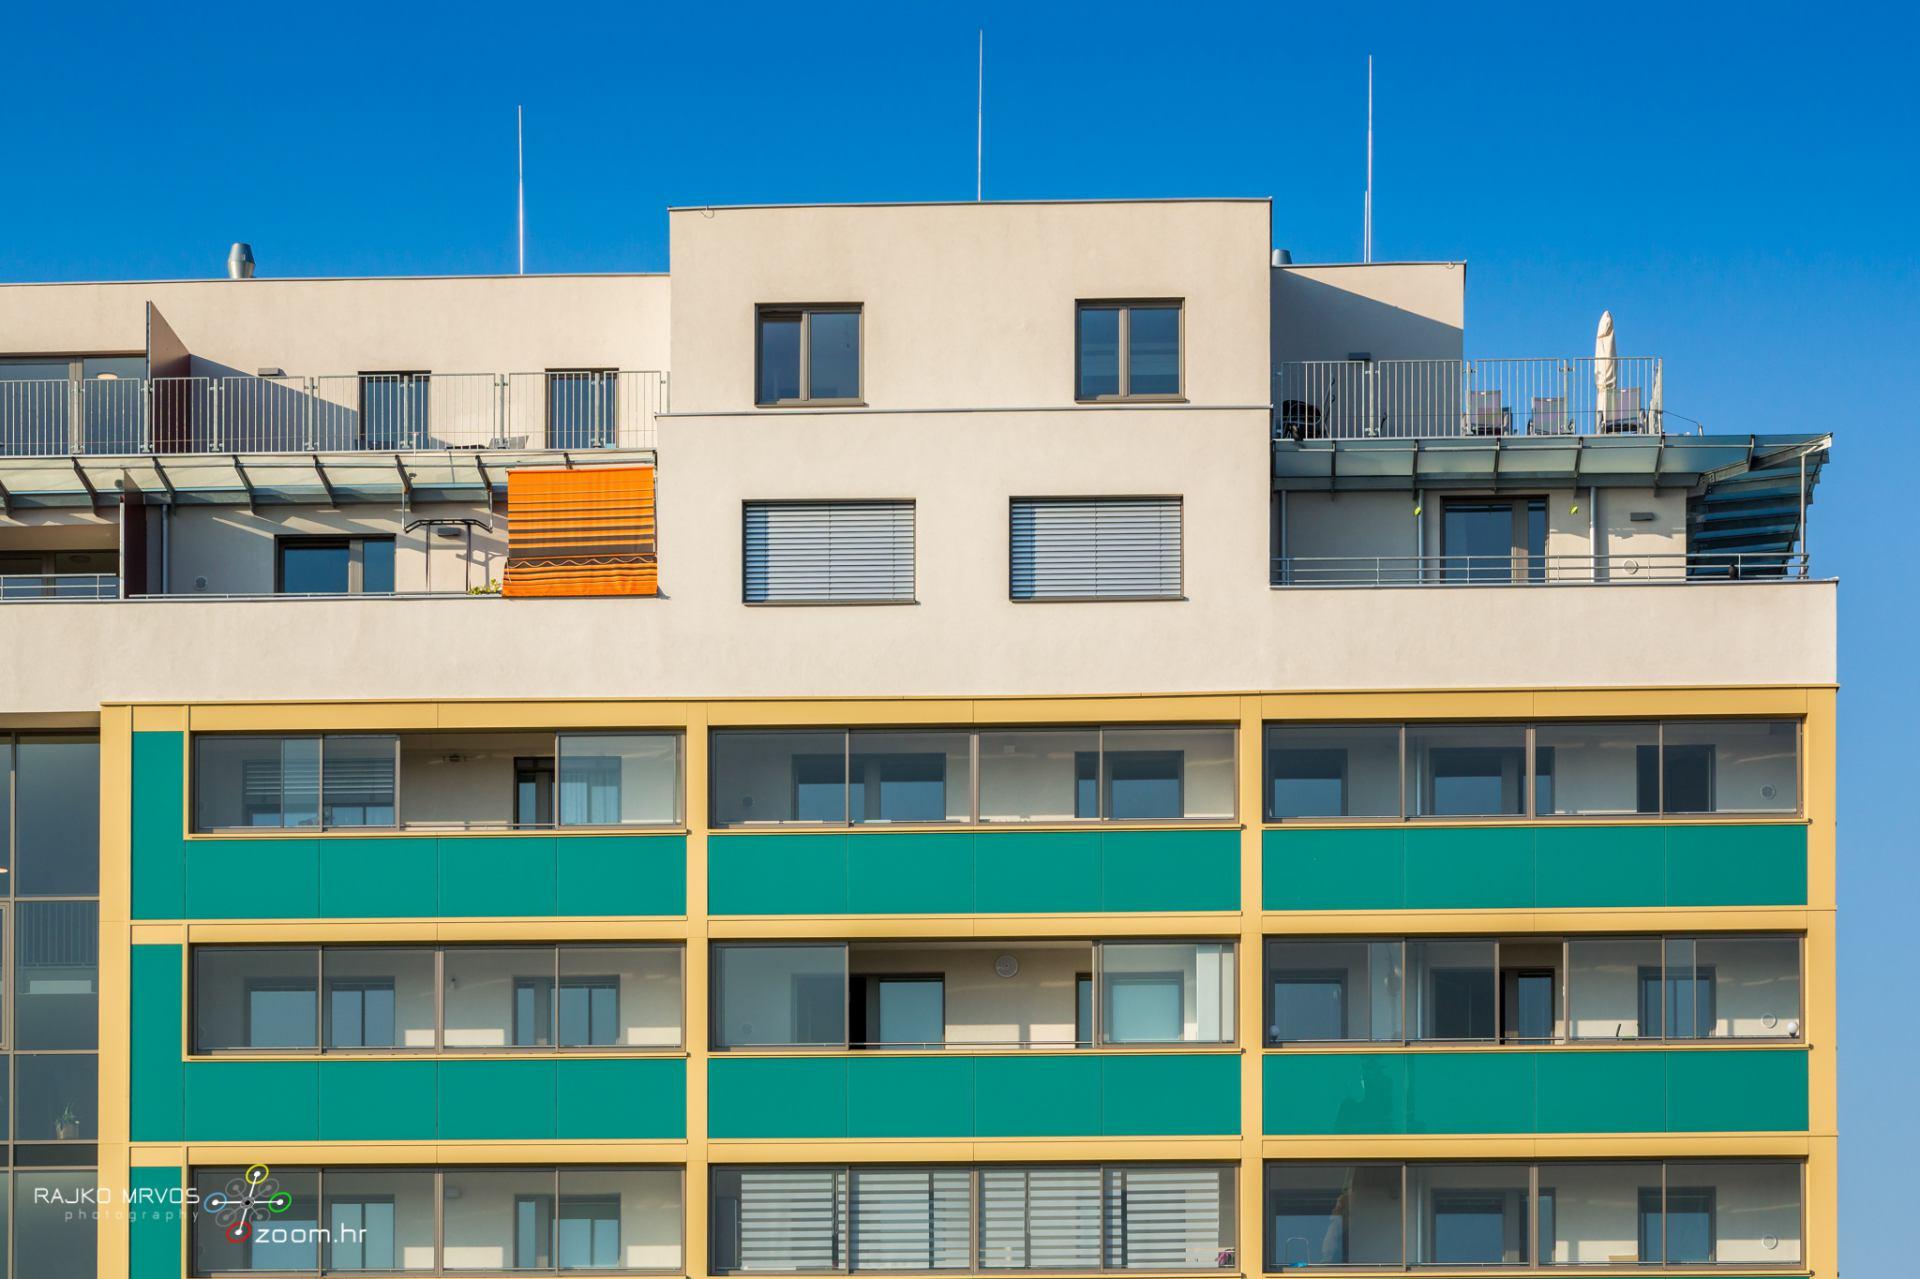 fotografiranje-interijera-fotograf-eksterijera-apartmana-vila-kuca-apartman-Beč-3